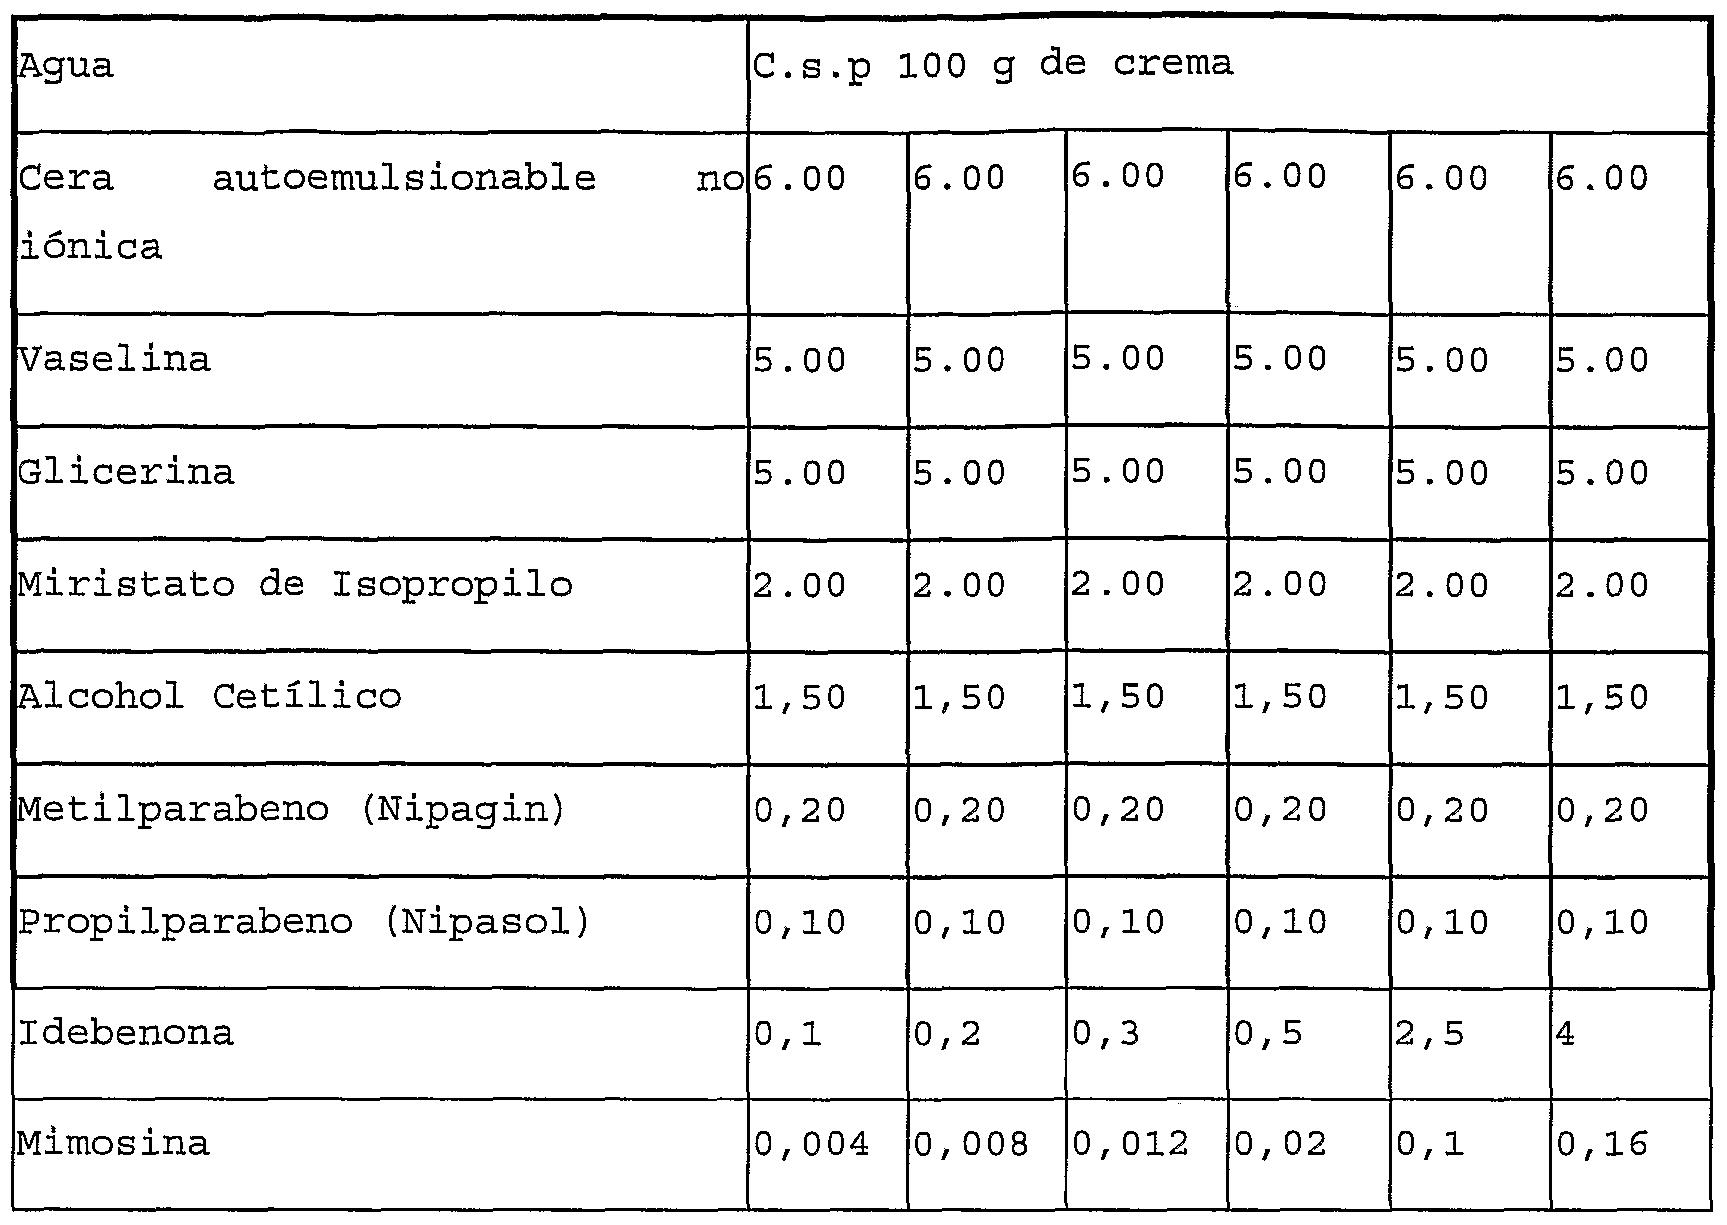 Rapa de atopicheskogo de la dermatitis